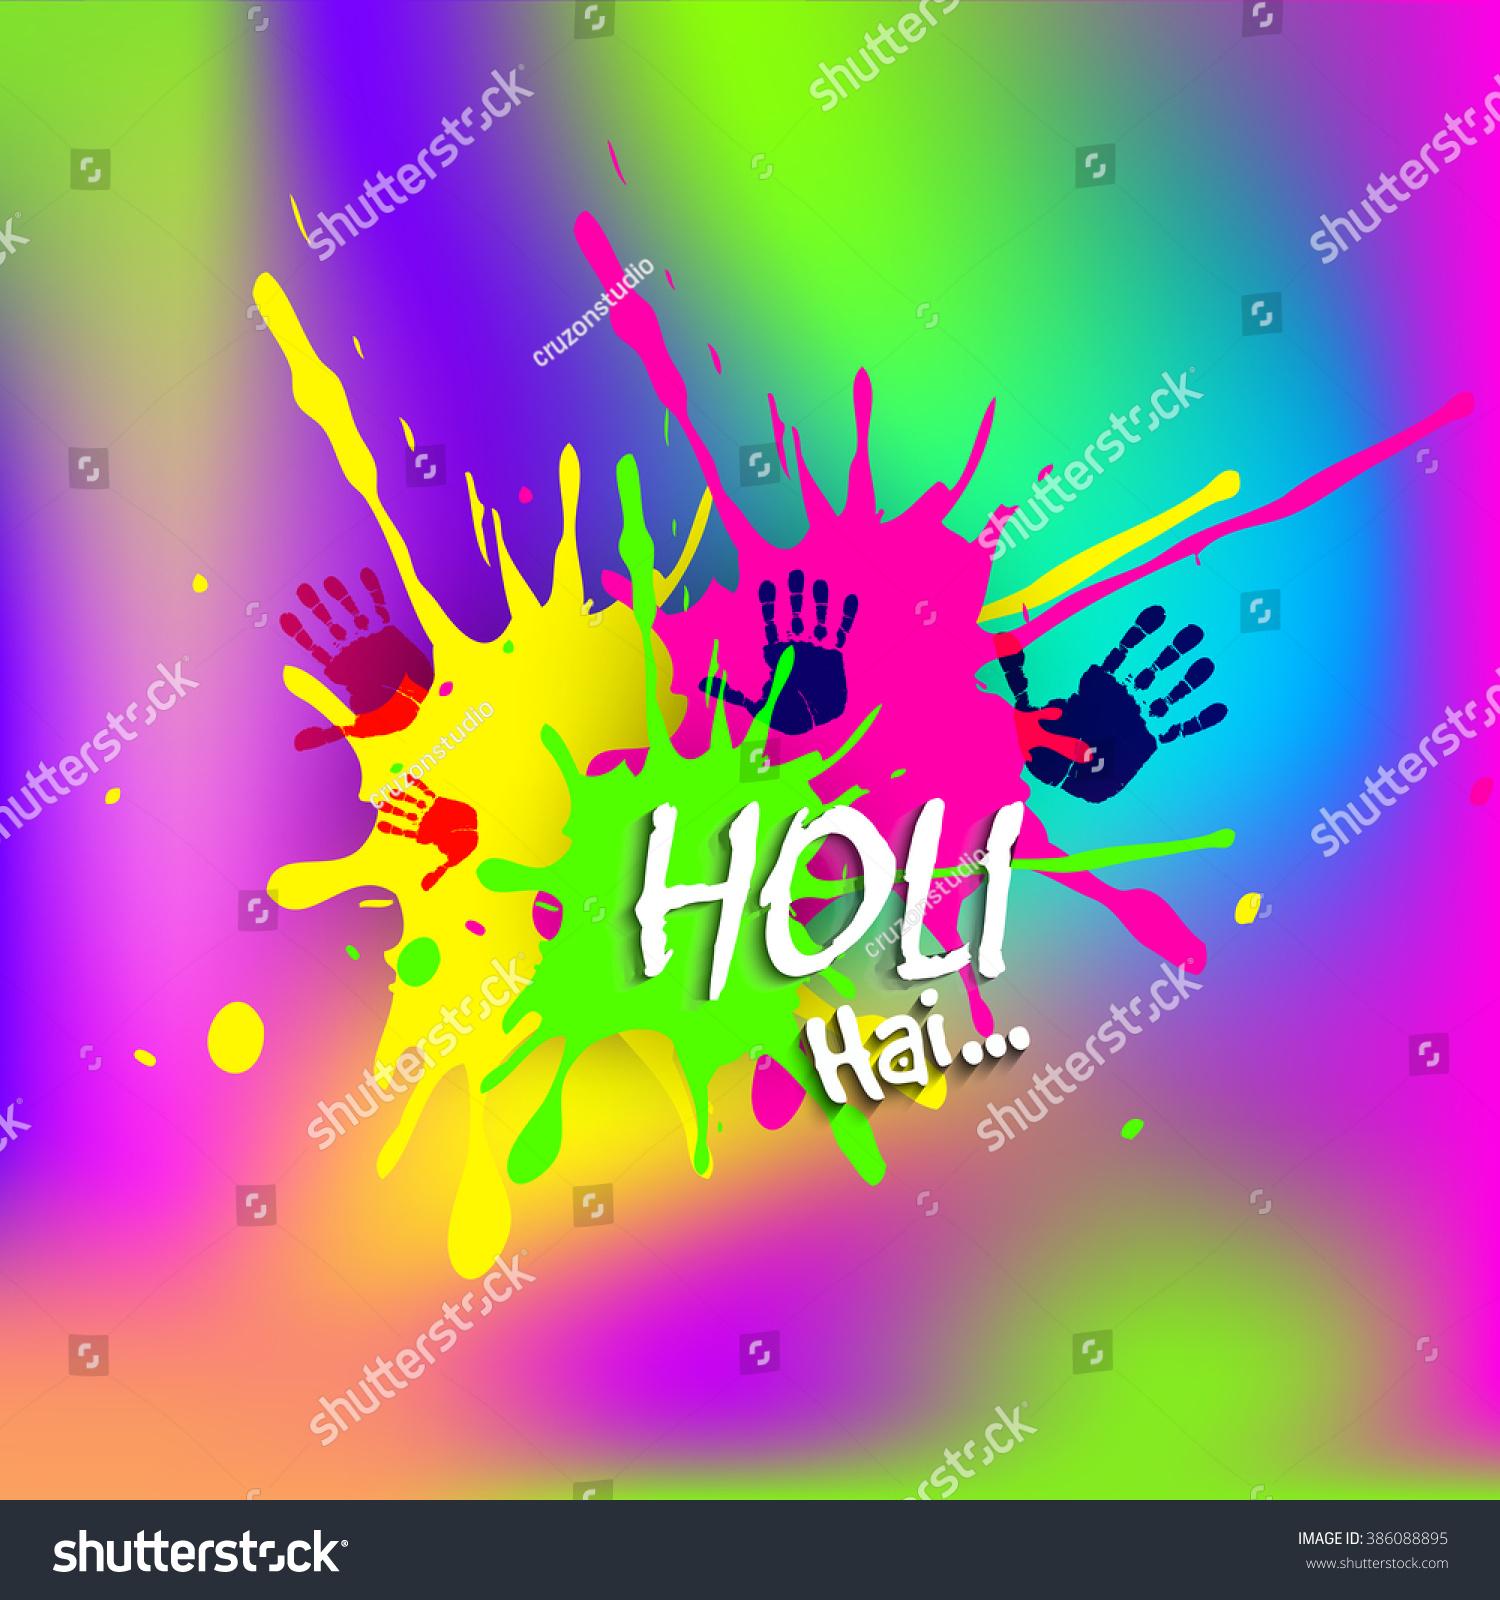 Holi Greeting Card Gallery Greetings Card Design Simple